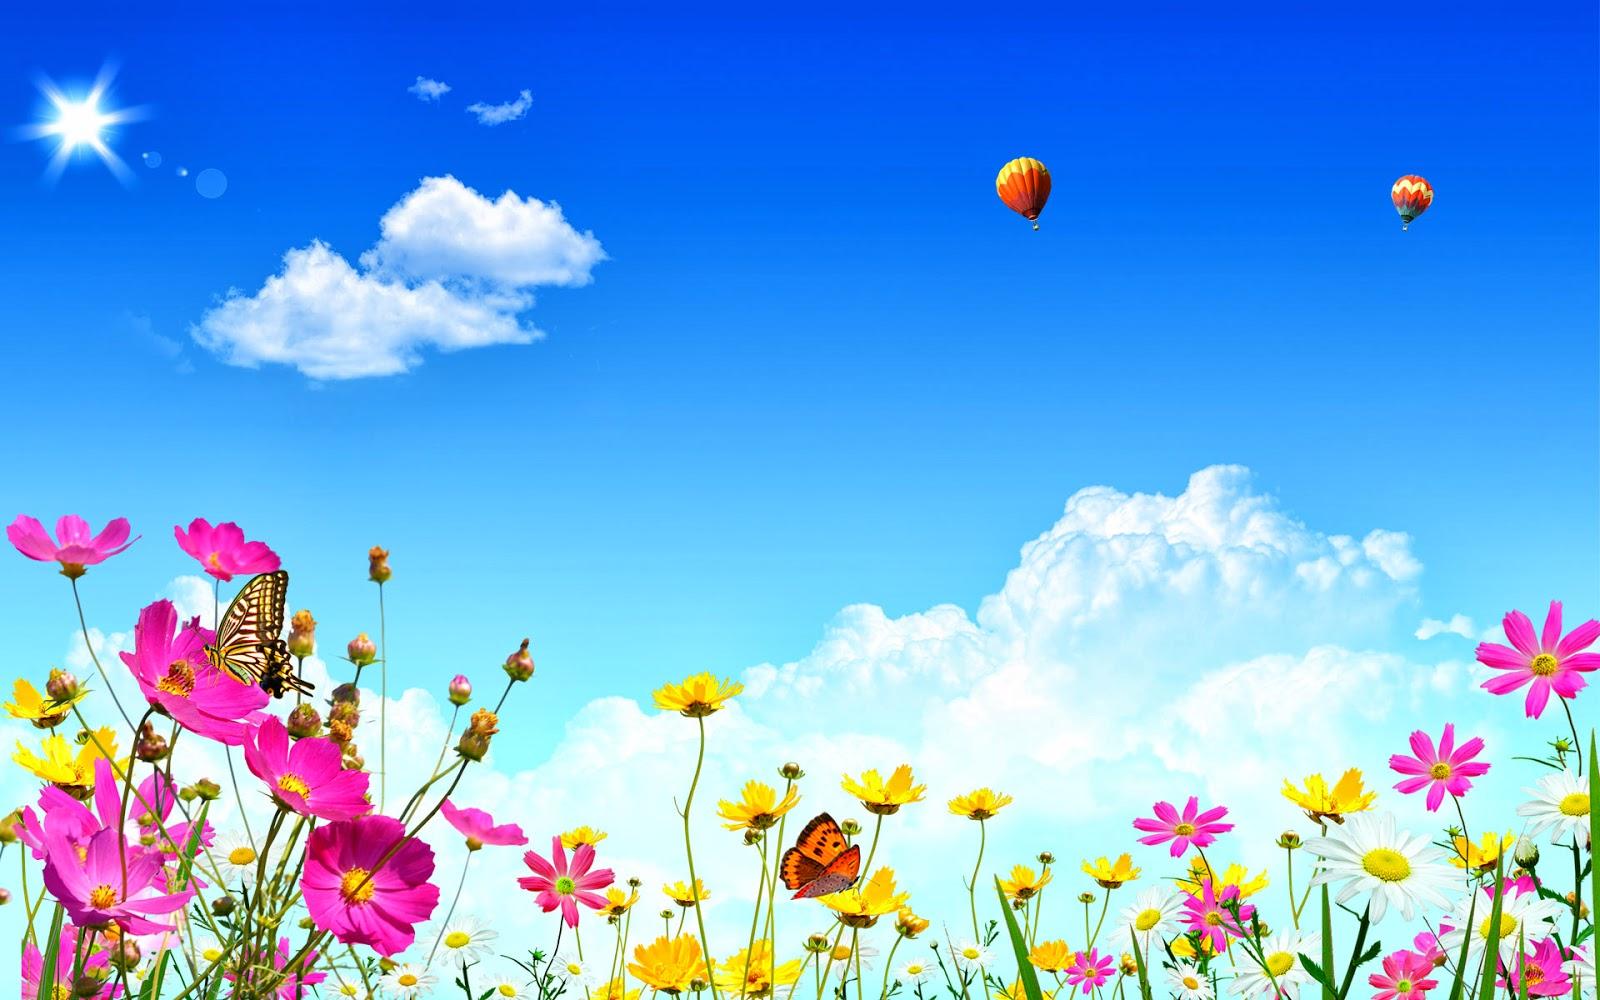 Fondo De Pantalla Abstracto Flores De Colores En Un Cielo Claro